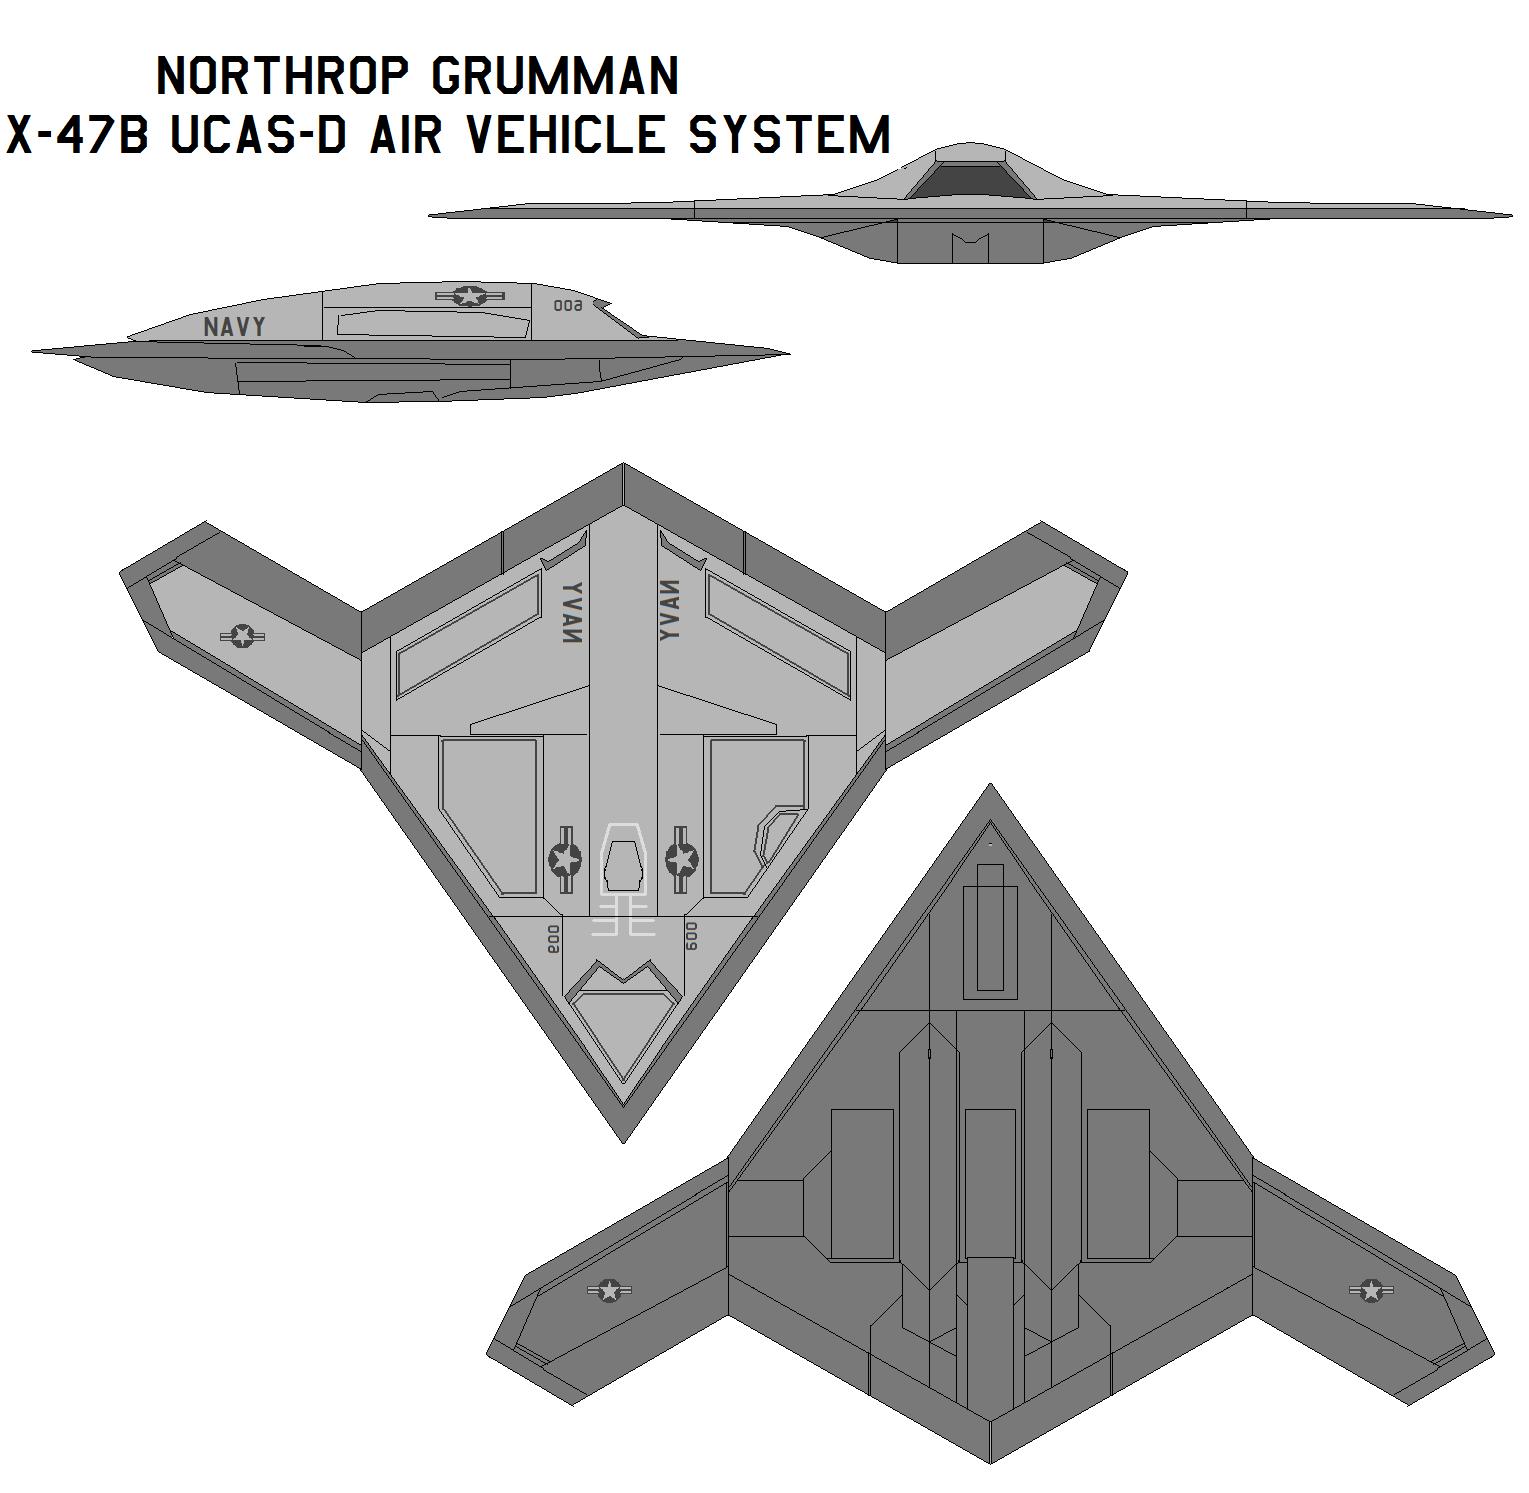 Free Printable Blueprints Northrop Grumman X 47b Ucas D By Bagera3005 On Deviantart